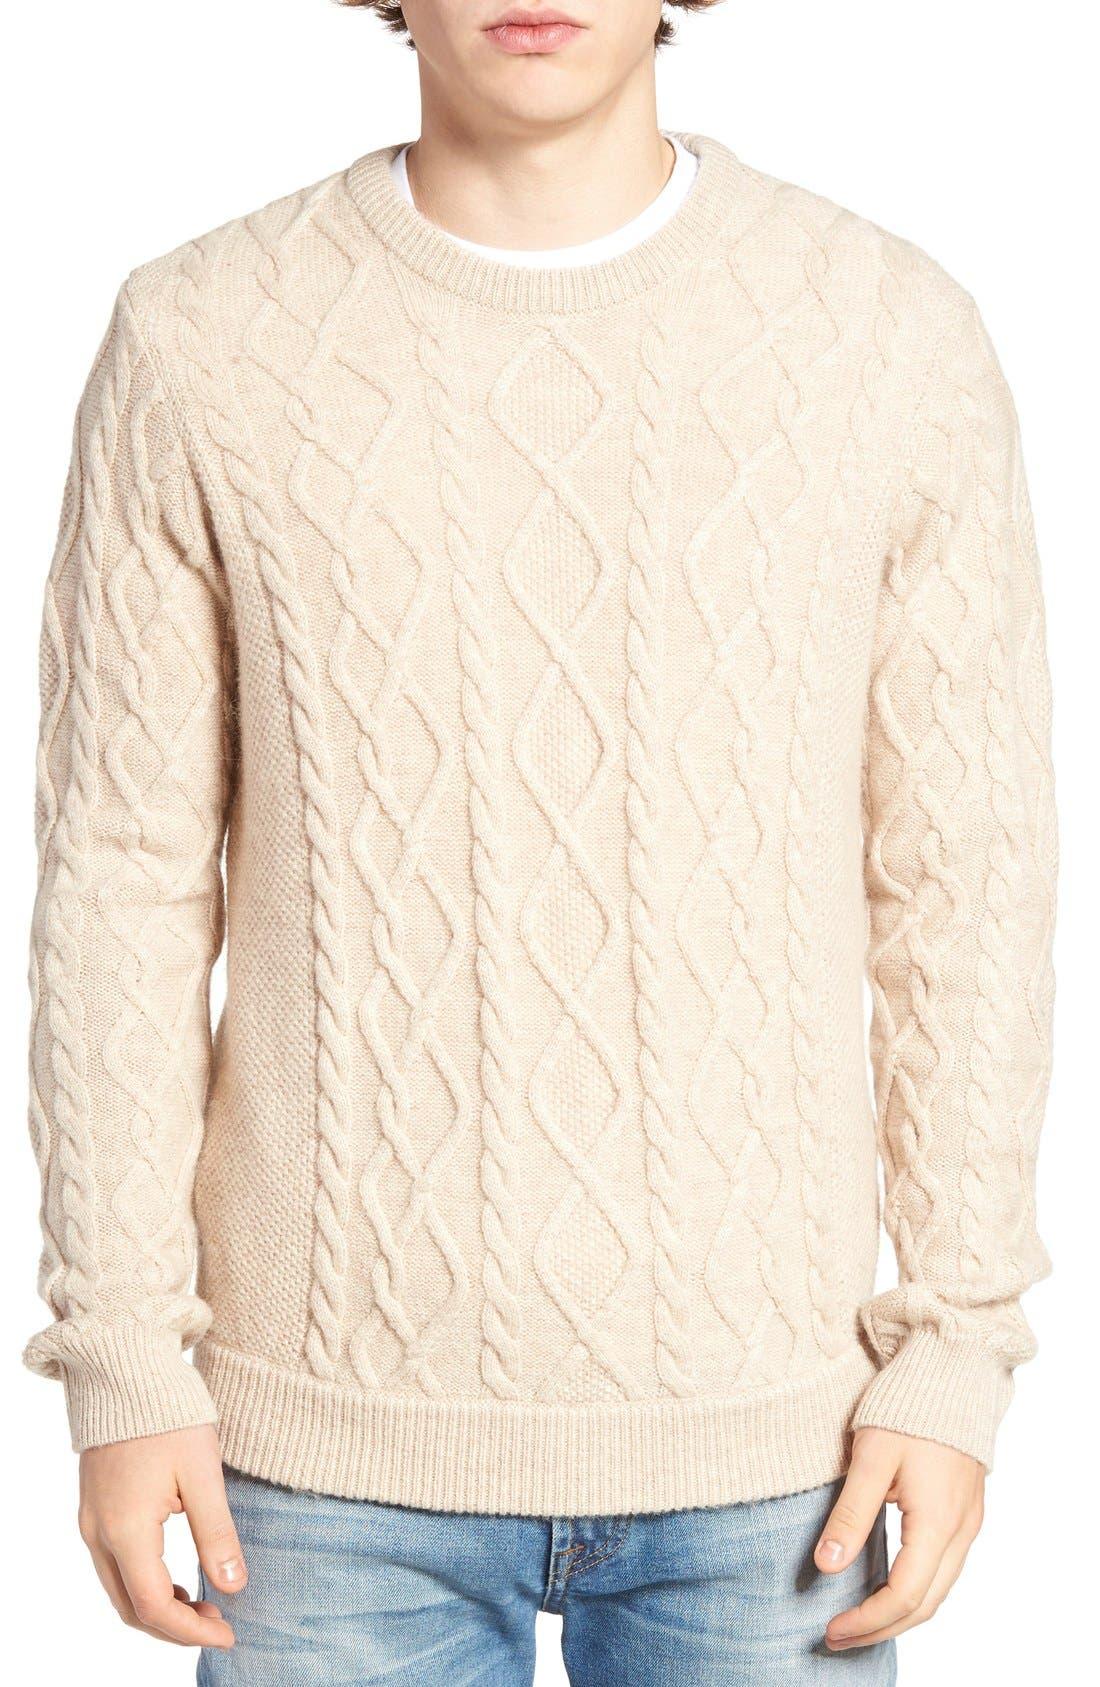 Fisherman Sweater,                             Main thumbnail 1, color,                             020